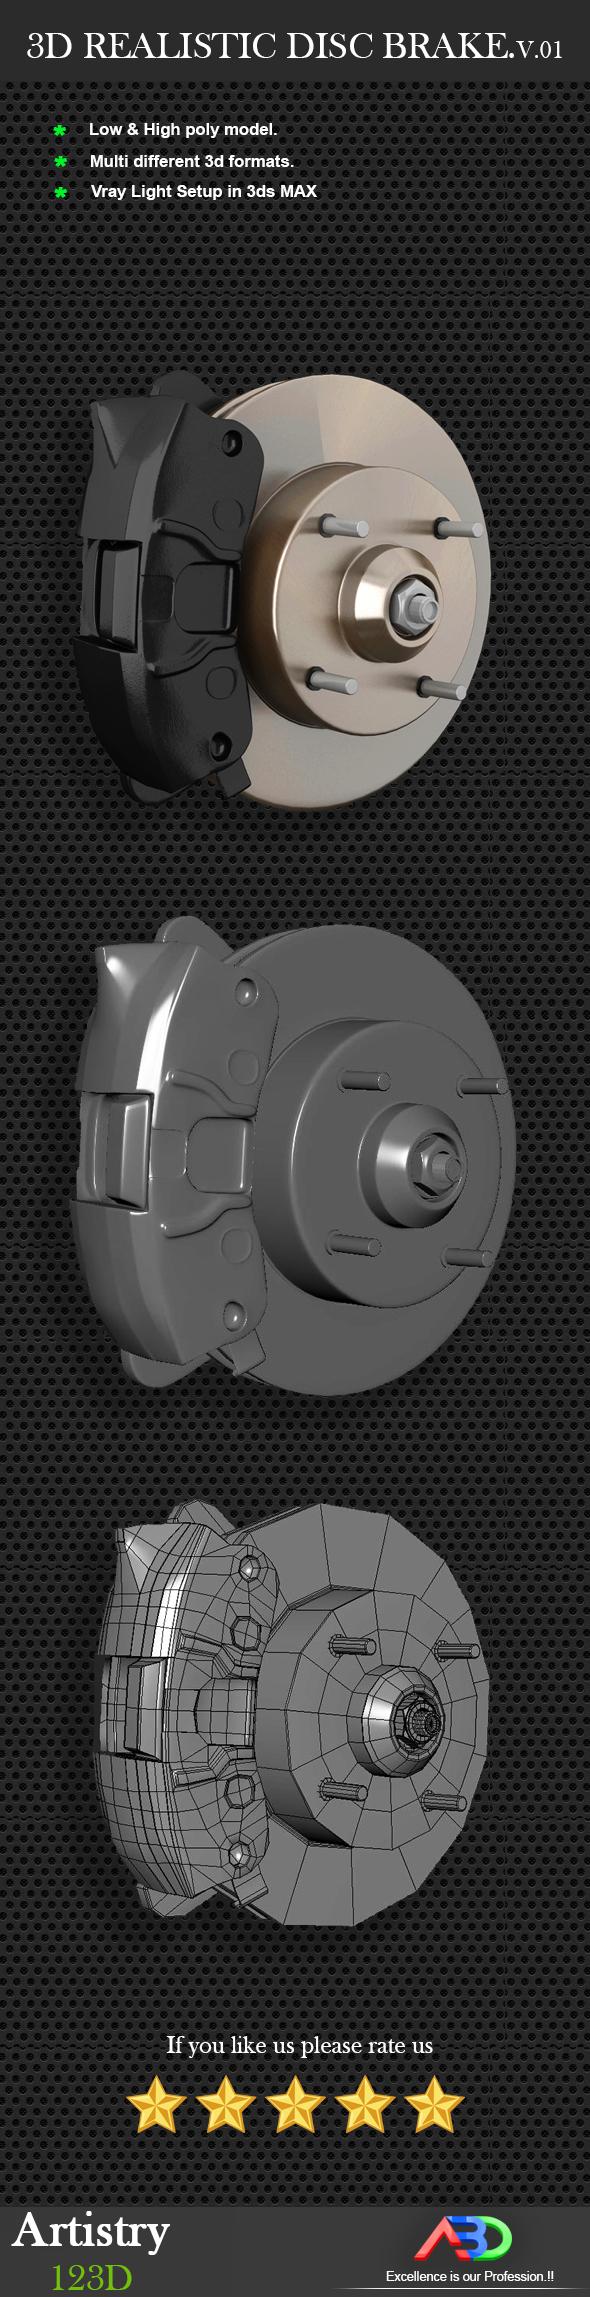 3D Realistic Disc brake Model - 3DOcean Item for Sale